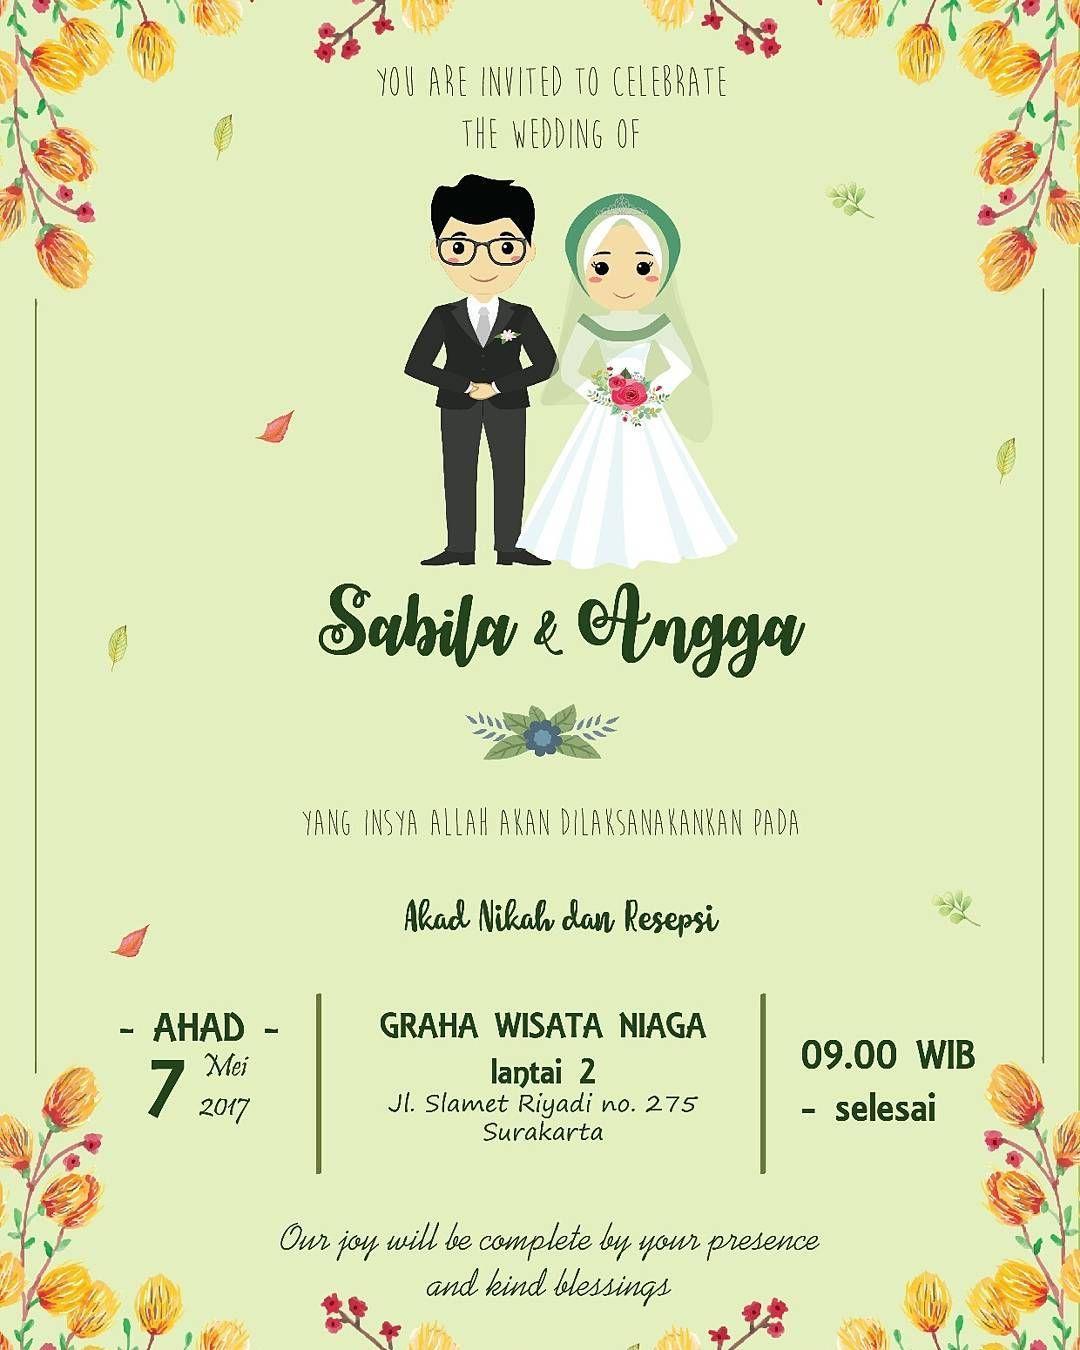 Pernikahan Islami Kartun : pernikahan, islami, kartun, Kartun, Nikah, Kartun,, Pernikahan,, Gambar, Pengantin